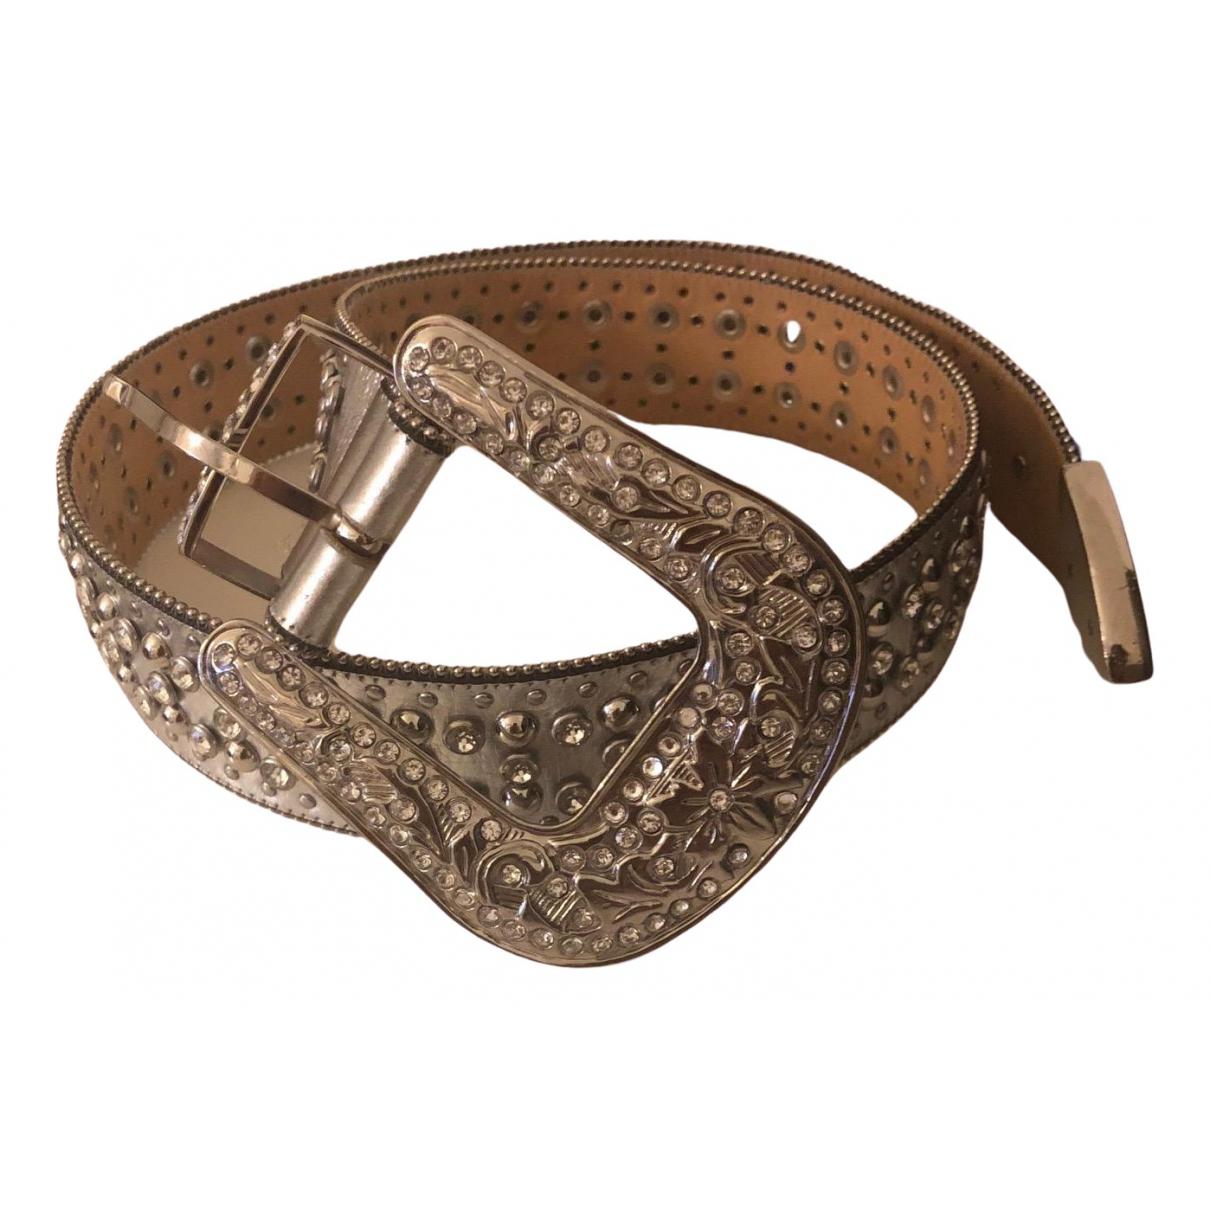 Philipp Plein \N Silver Leather belt for Women 85 cm